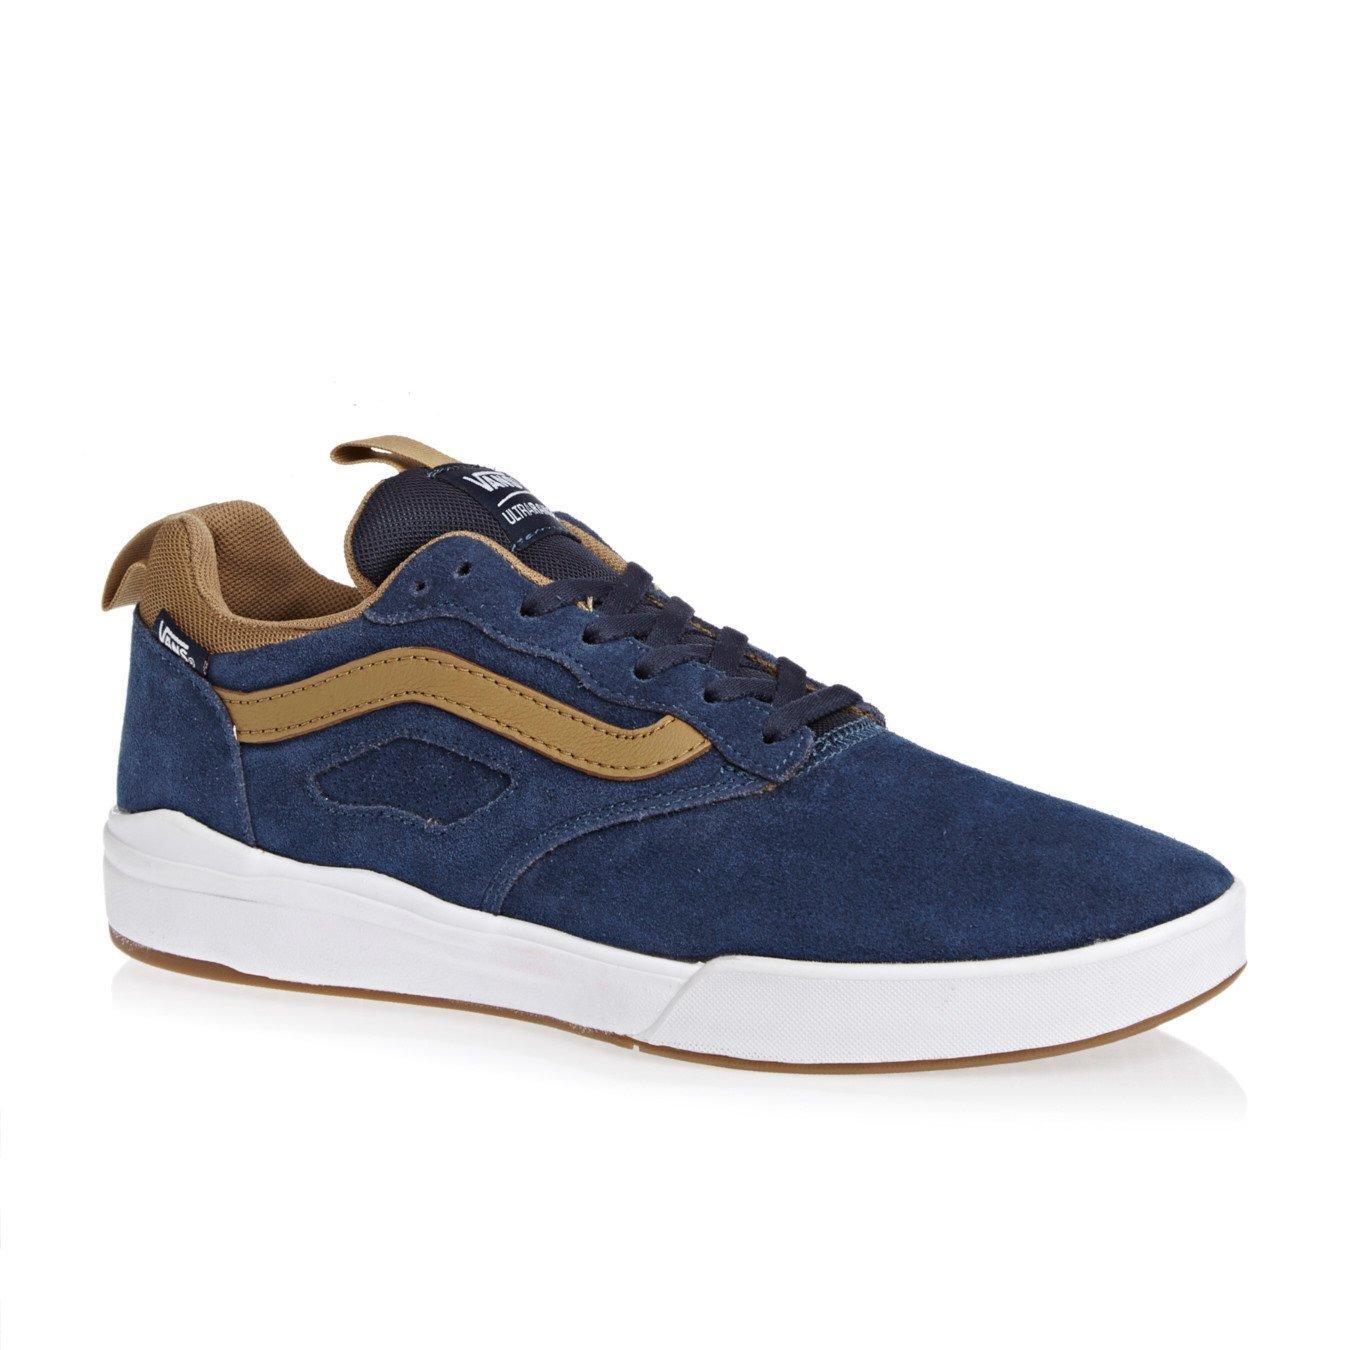 a25a1c3933 Vans Ultrarange Pro Dress Blues Medal Bronze Skate Shoes  Amazon.co.uk   Shoes   Bags